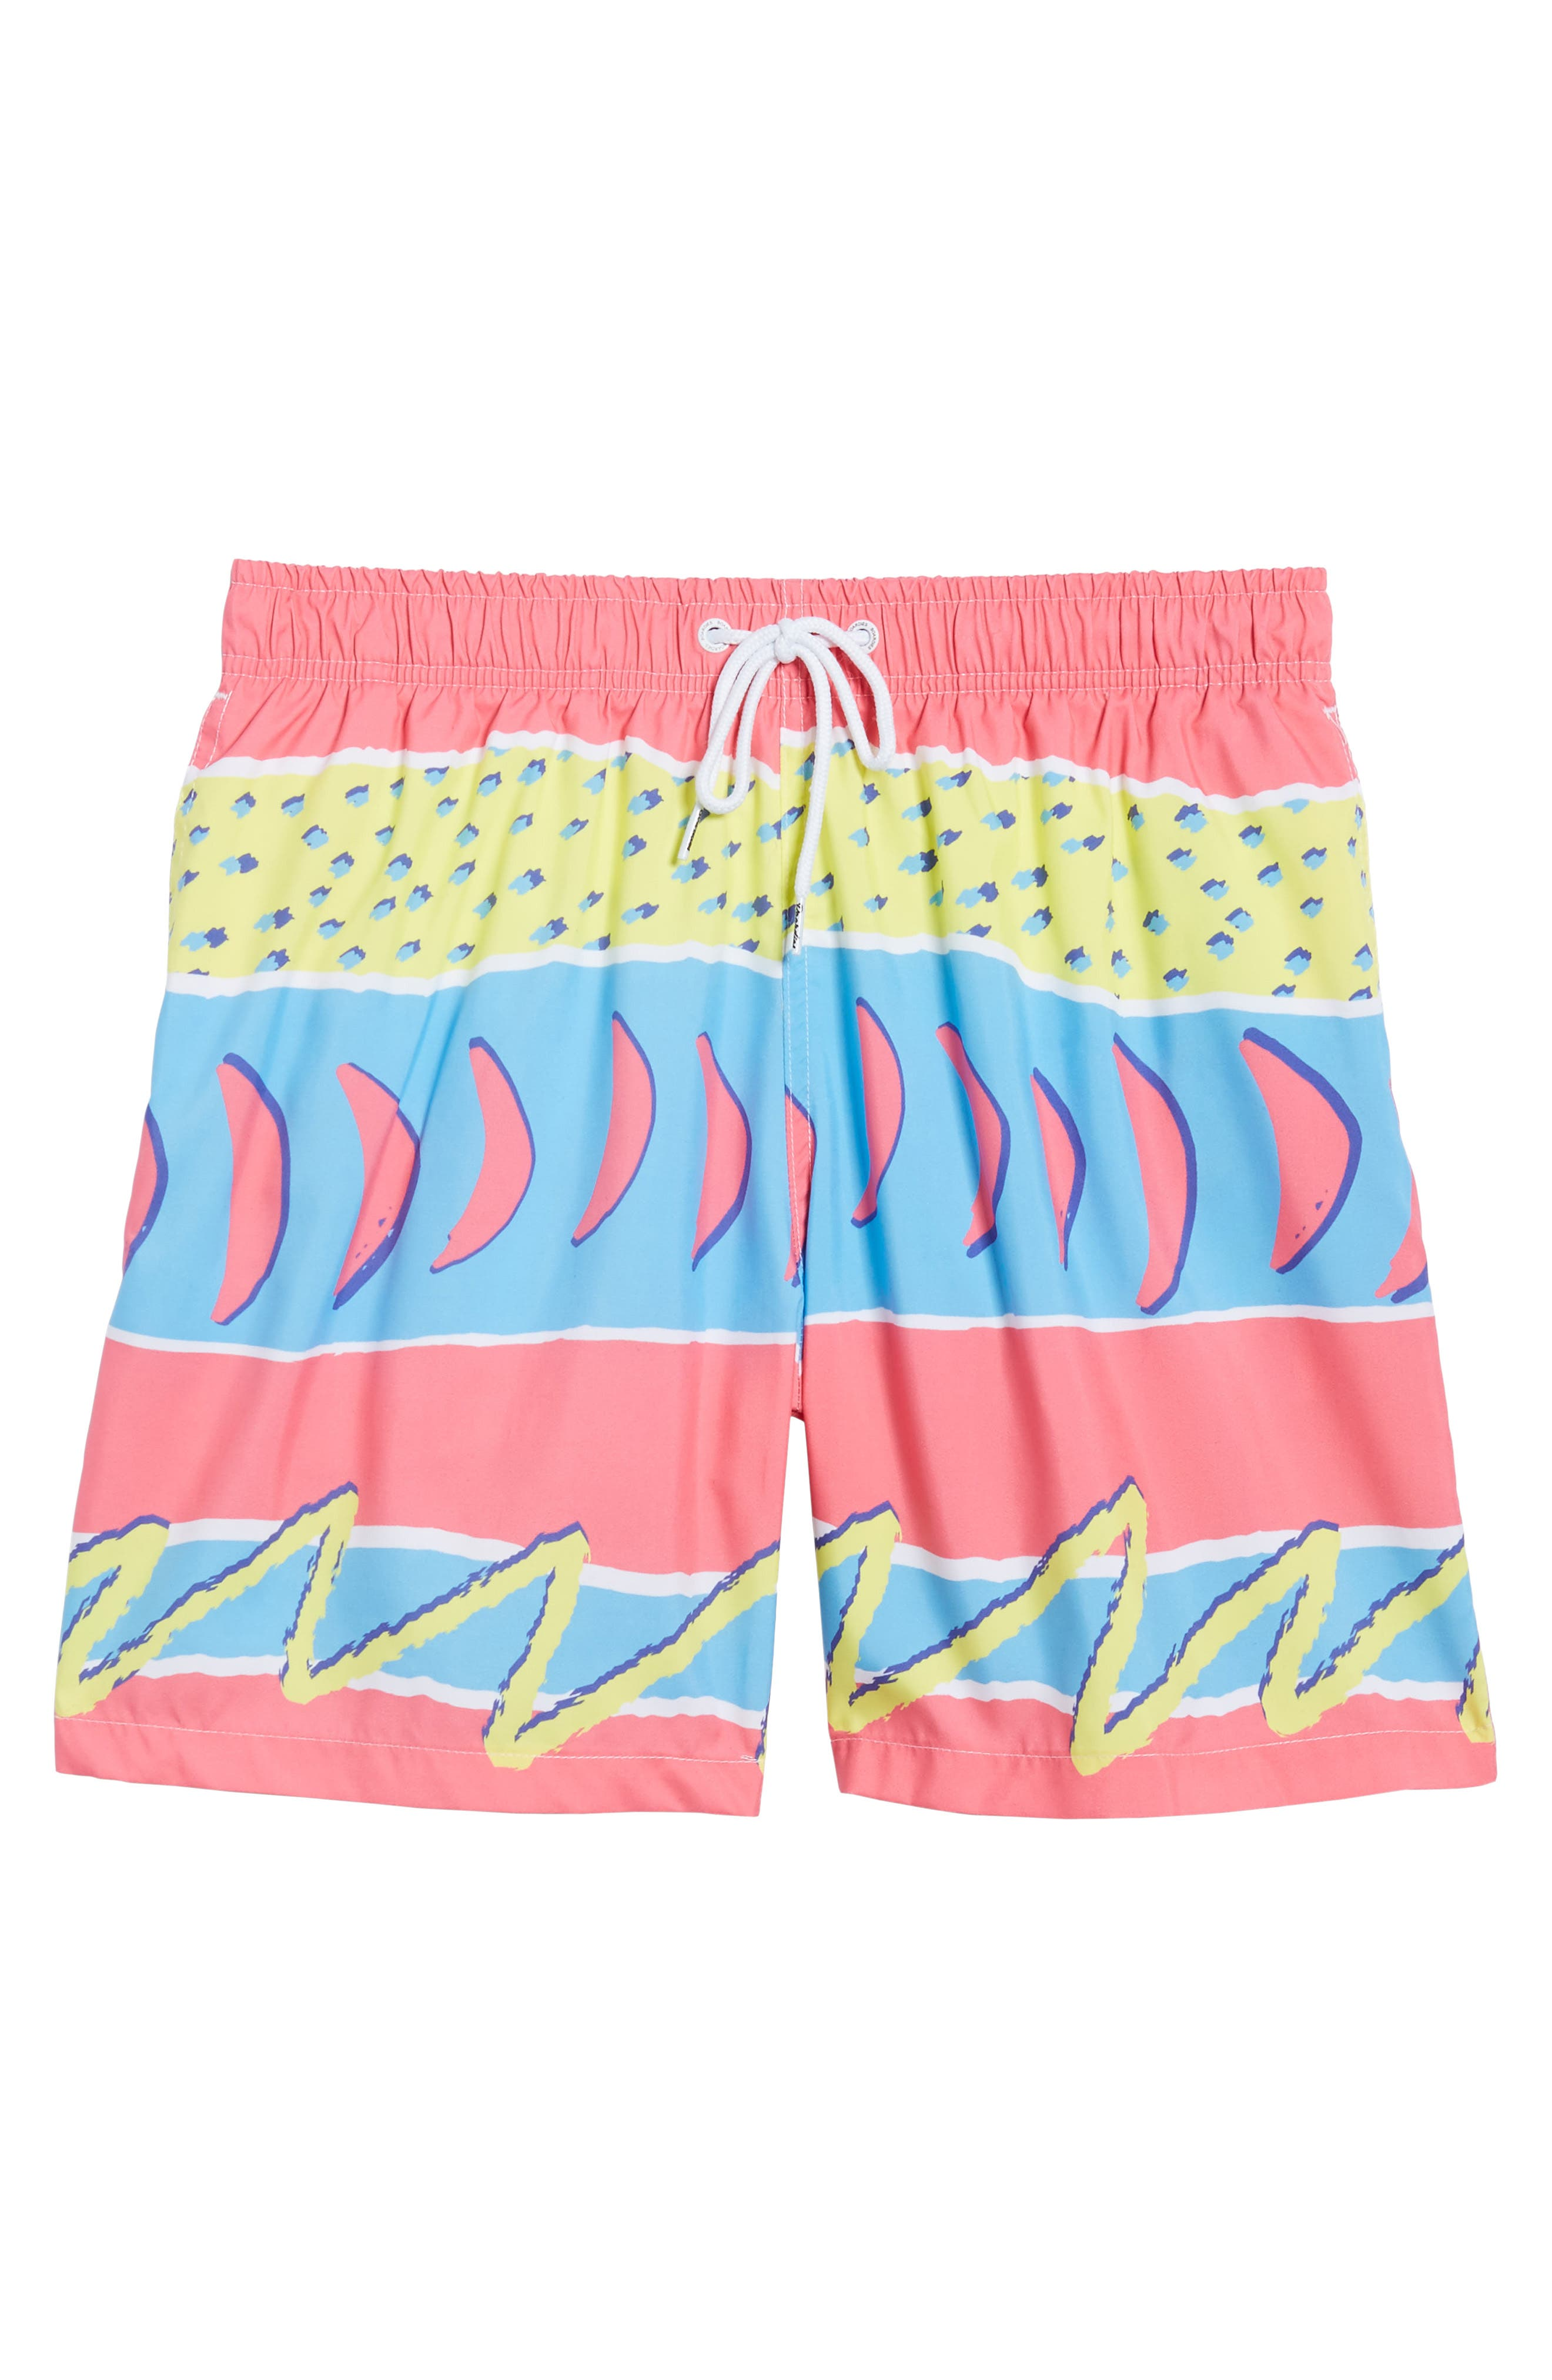 Fresh Prince Board Shorts,                             Alternate thumbnail 6, color,                             Multi